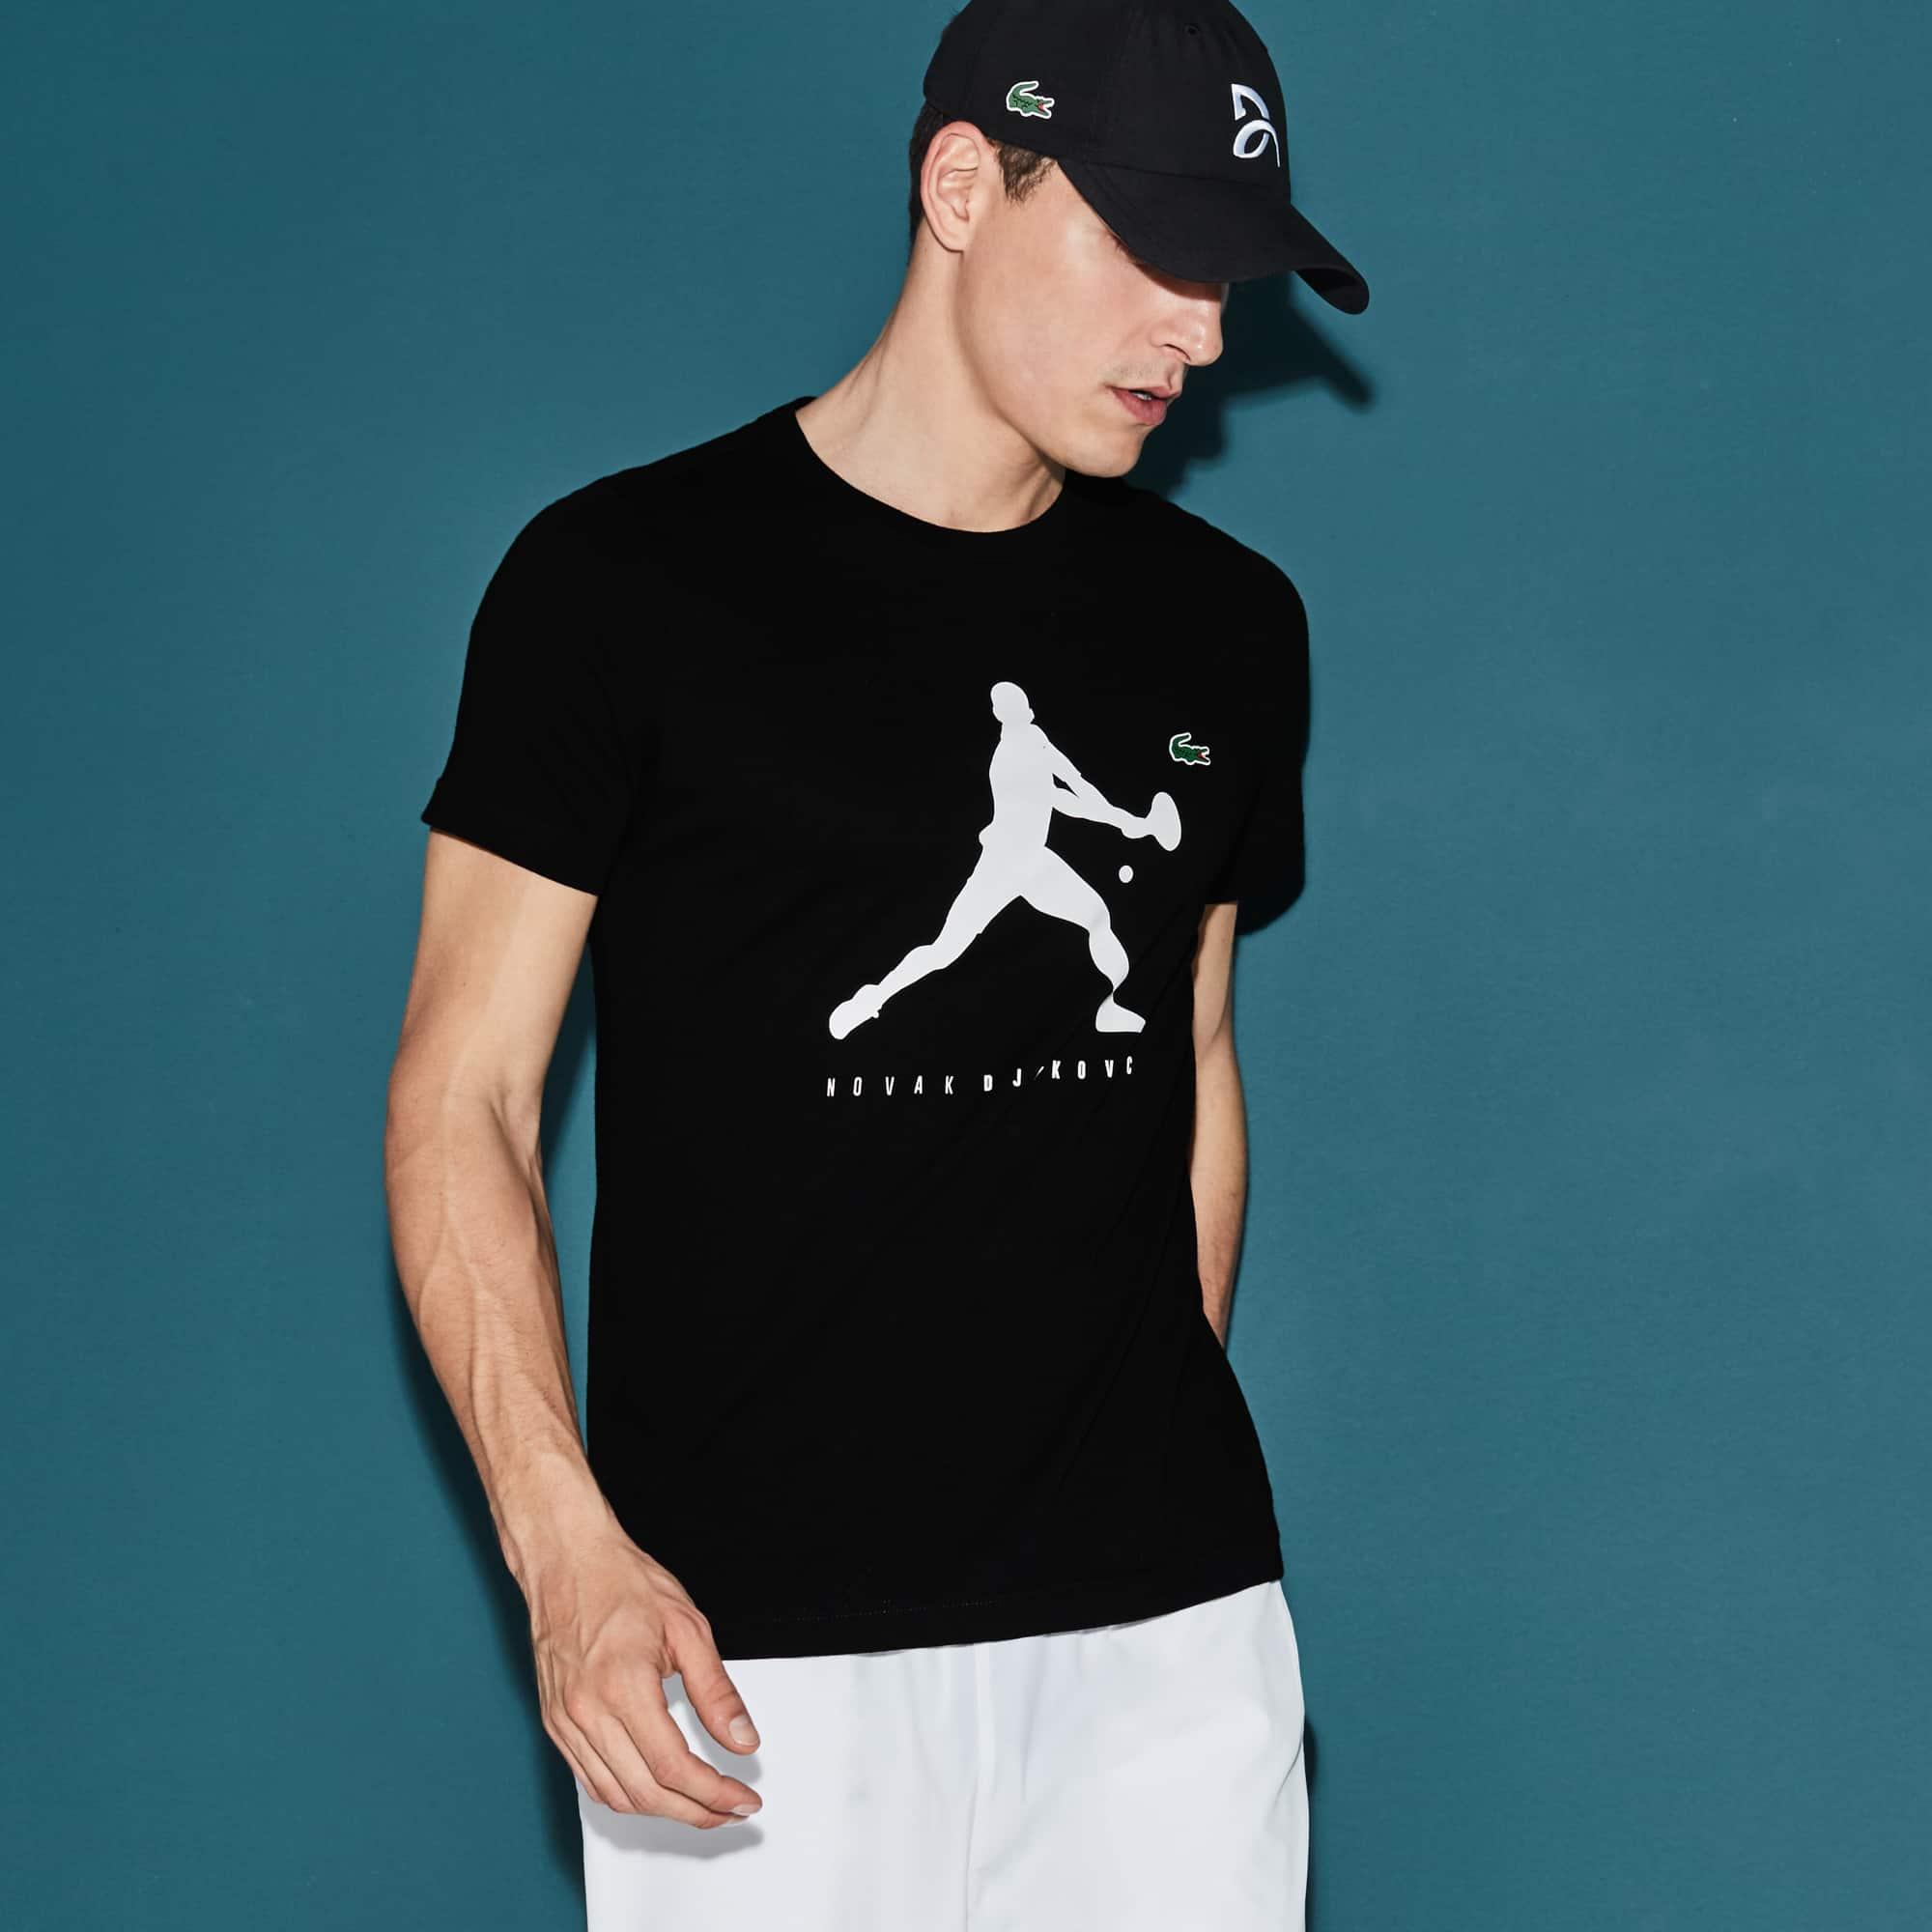 T-shirt Col Rond en Jersey Uni avec Imprimé - Collection Novak Djokovic Support With Style